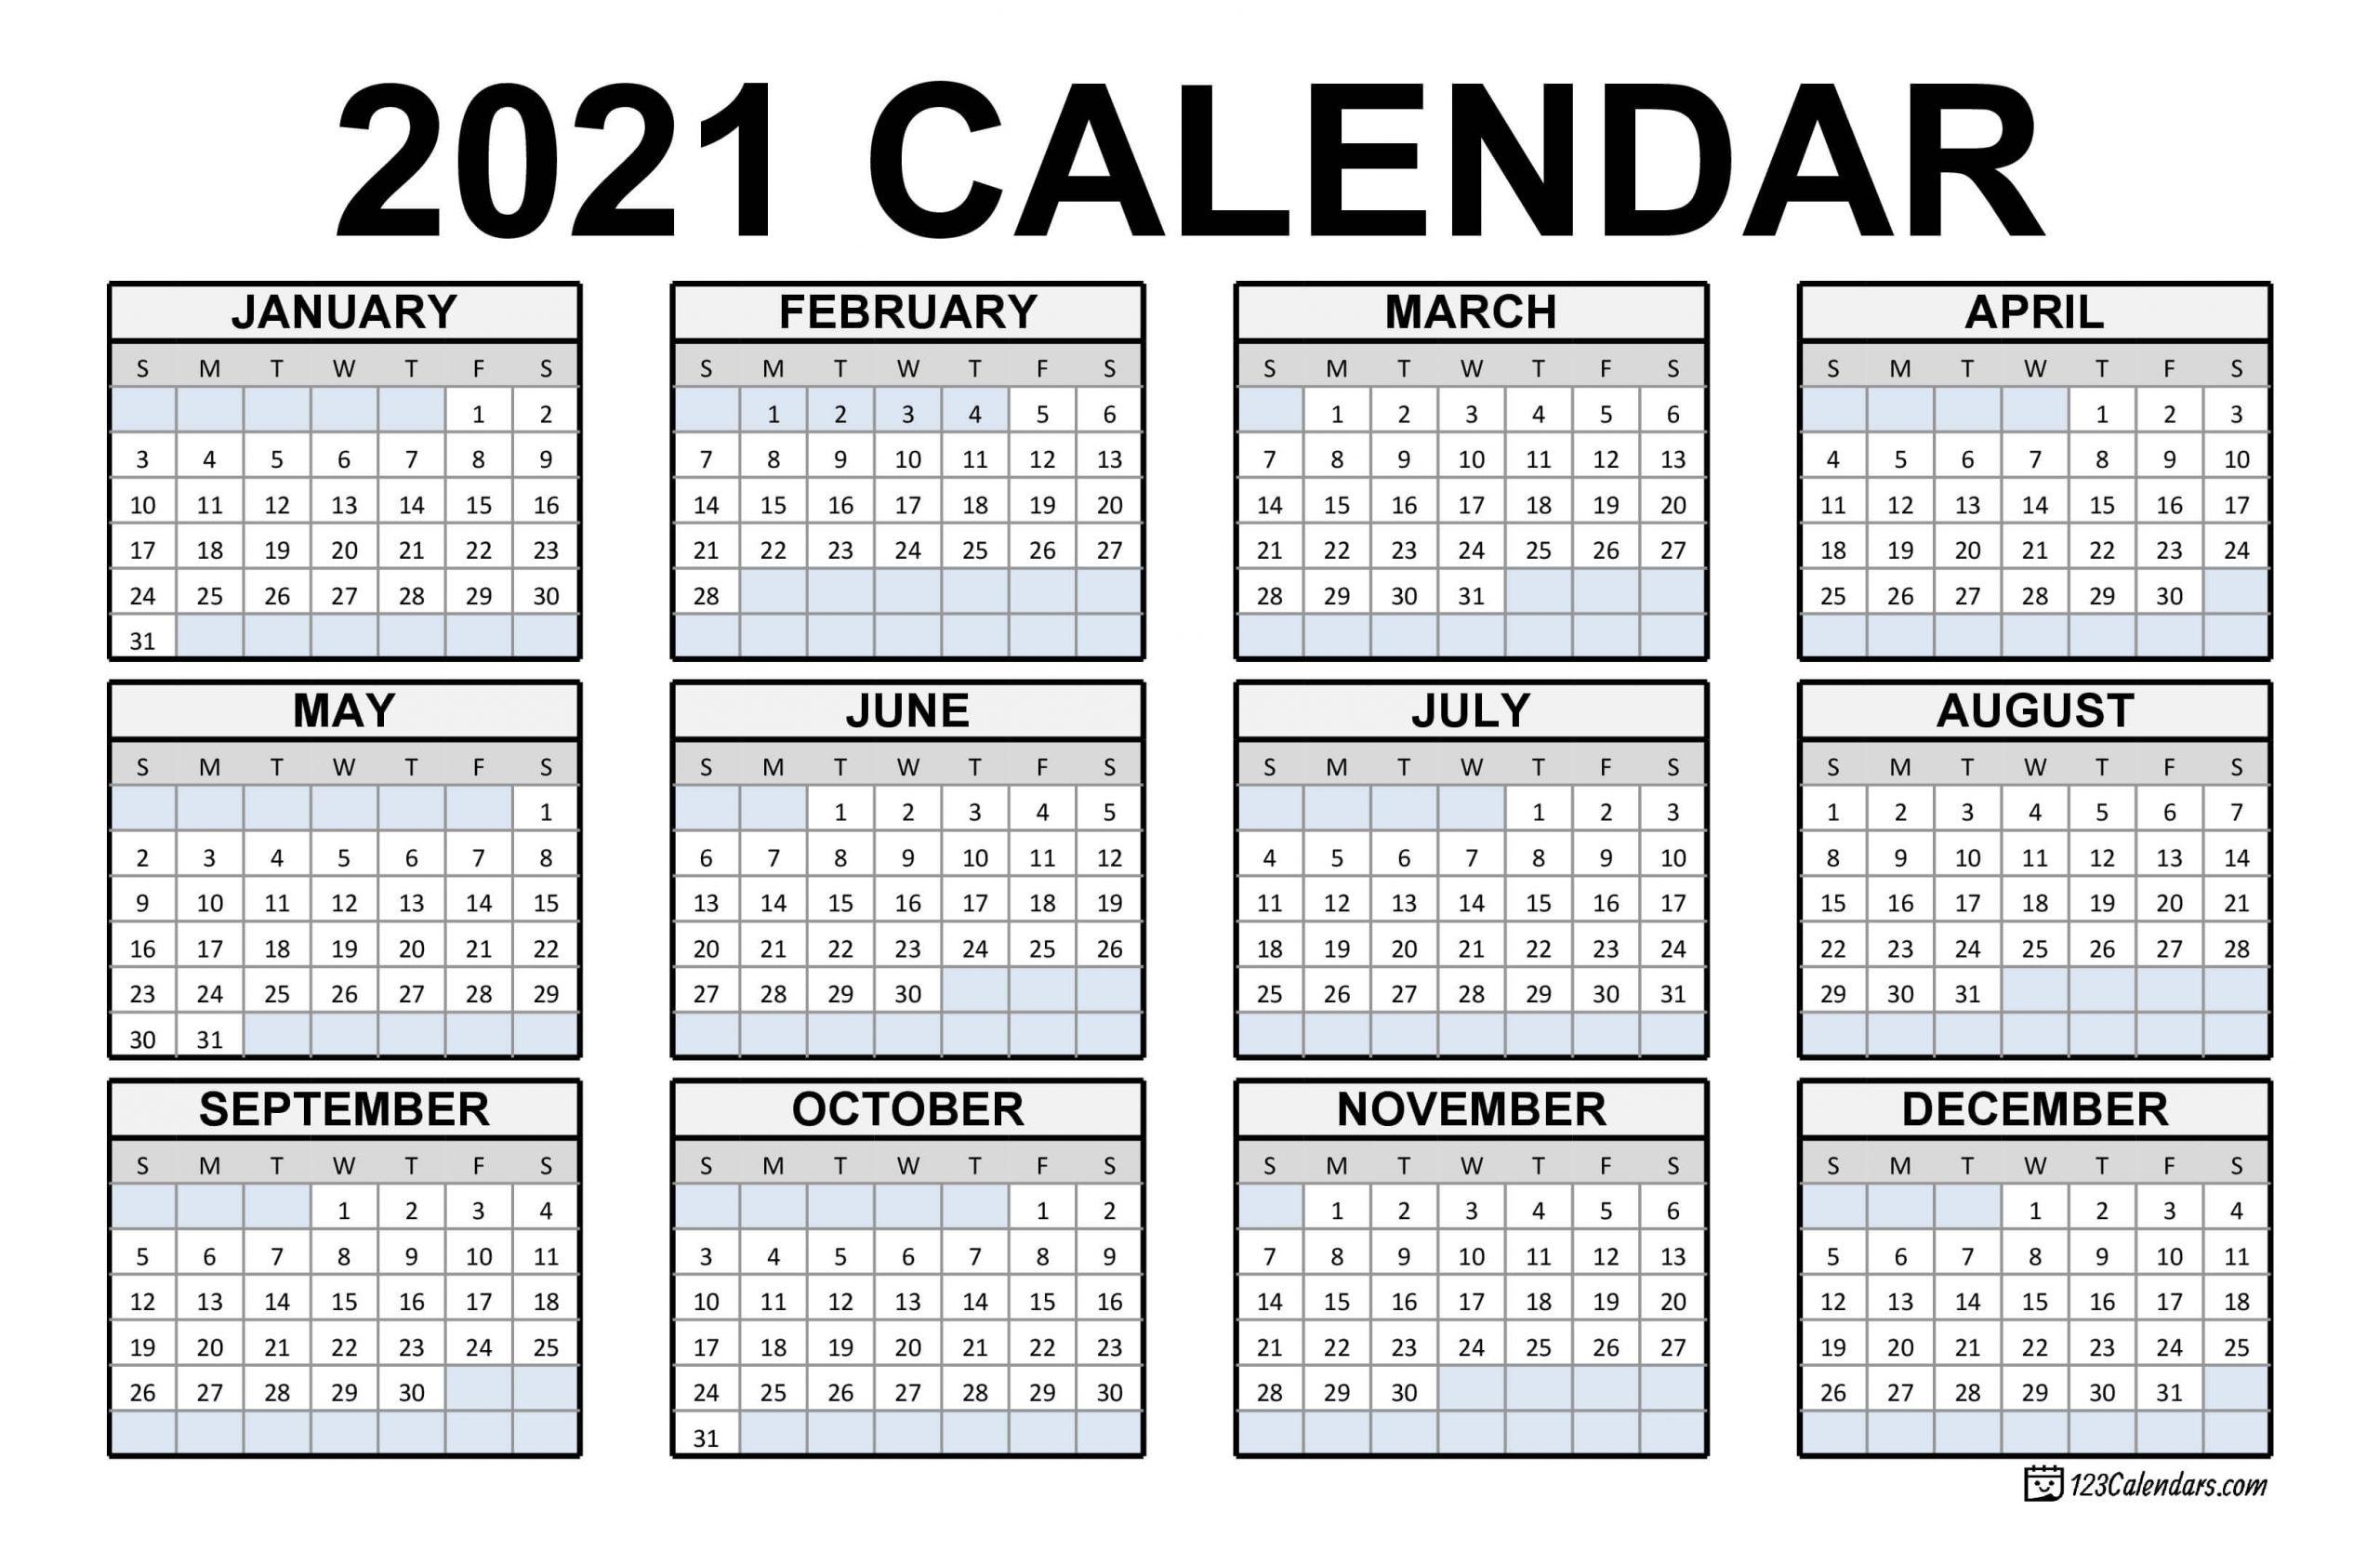 2021 Printable Calendar | 123Calendars